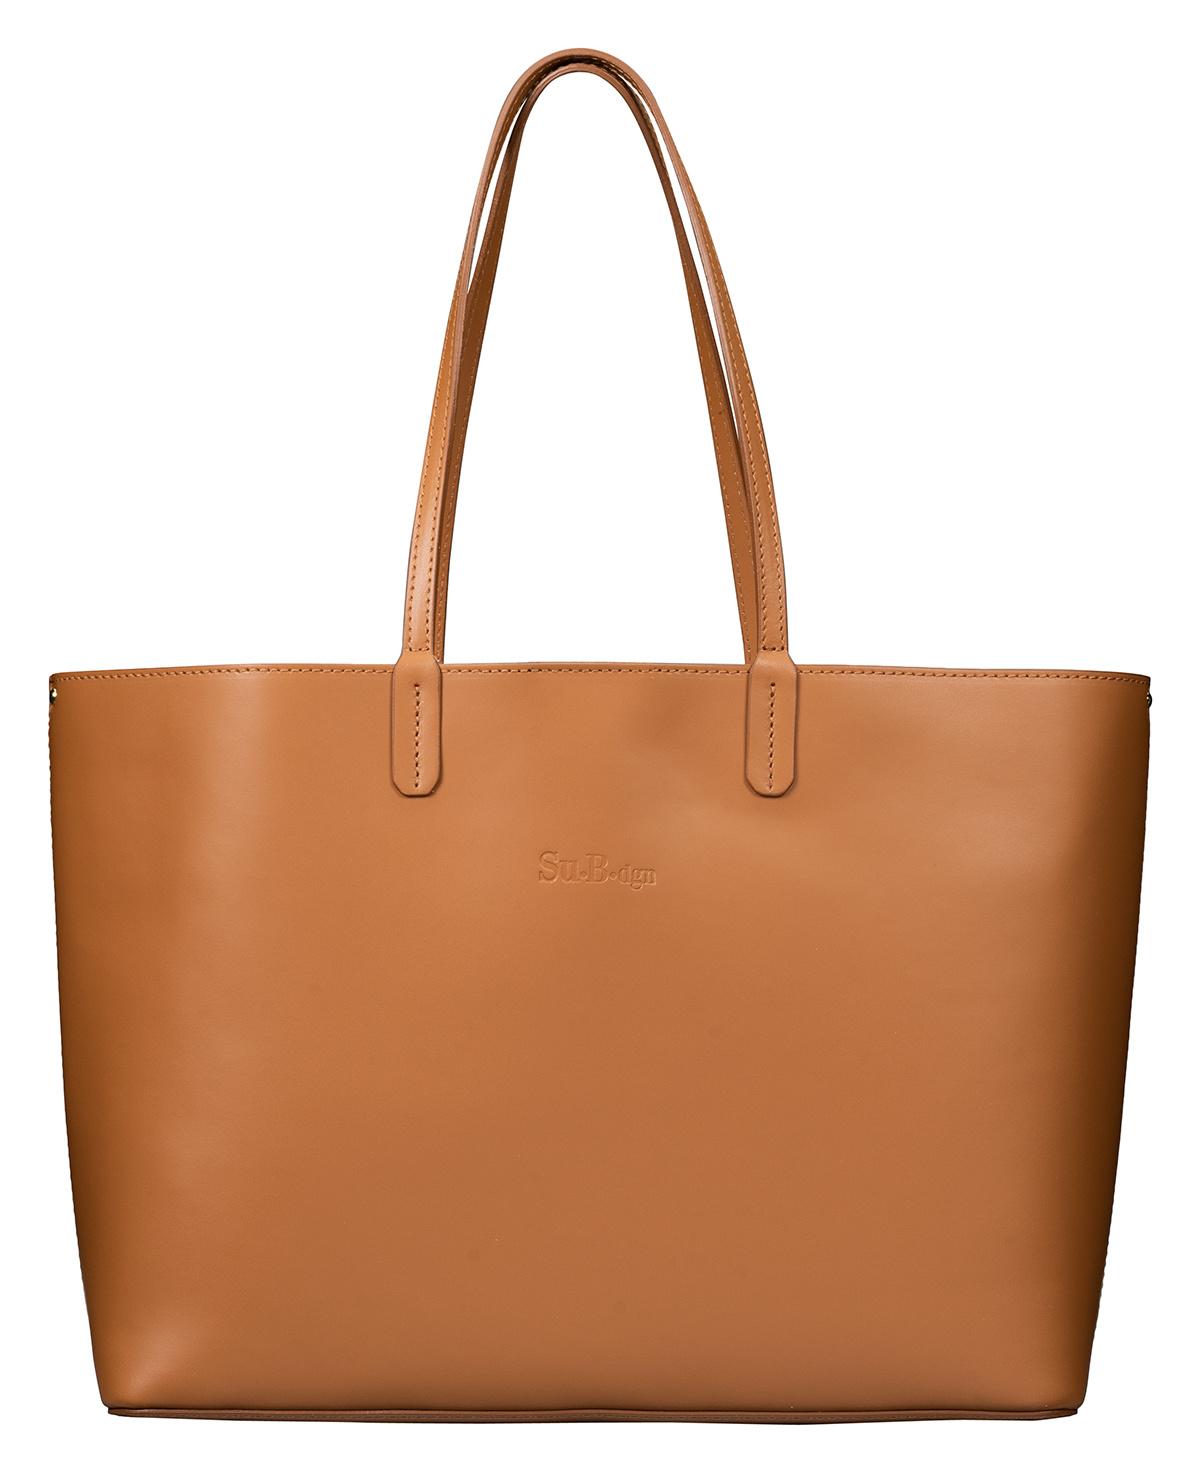 c63d2c031e2 Luxe Tote en Shopper Tas voor Dames | Bruin - Su.B Collection